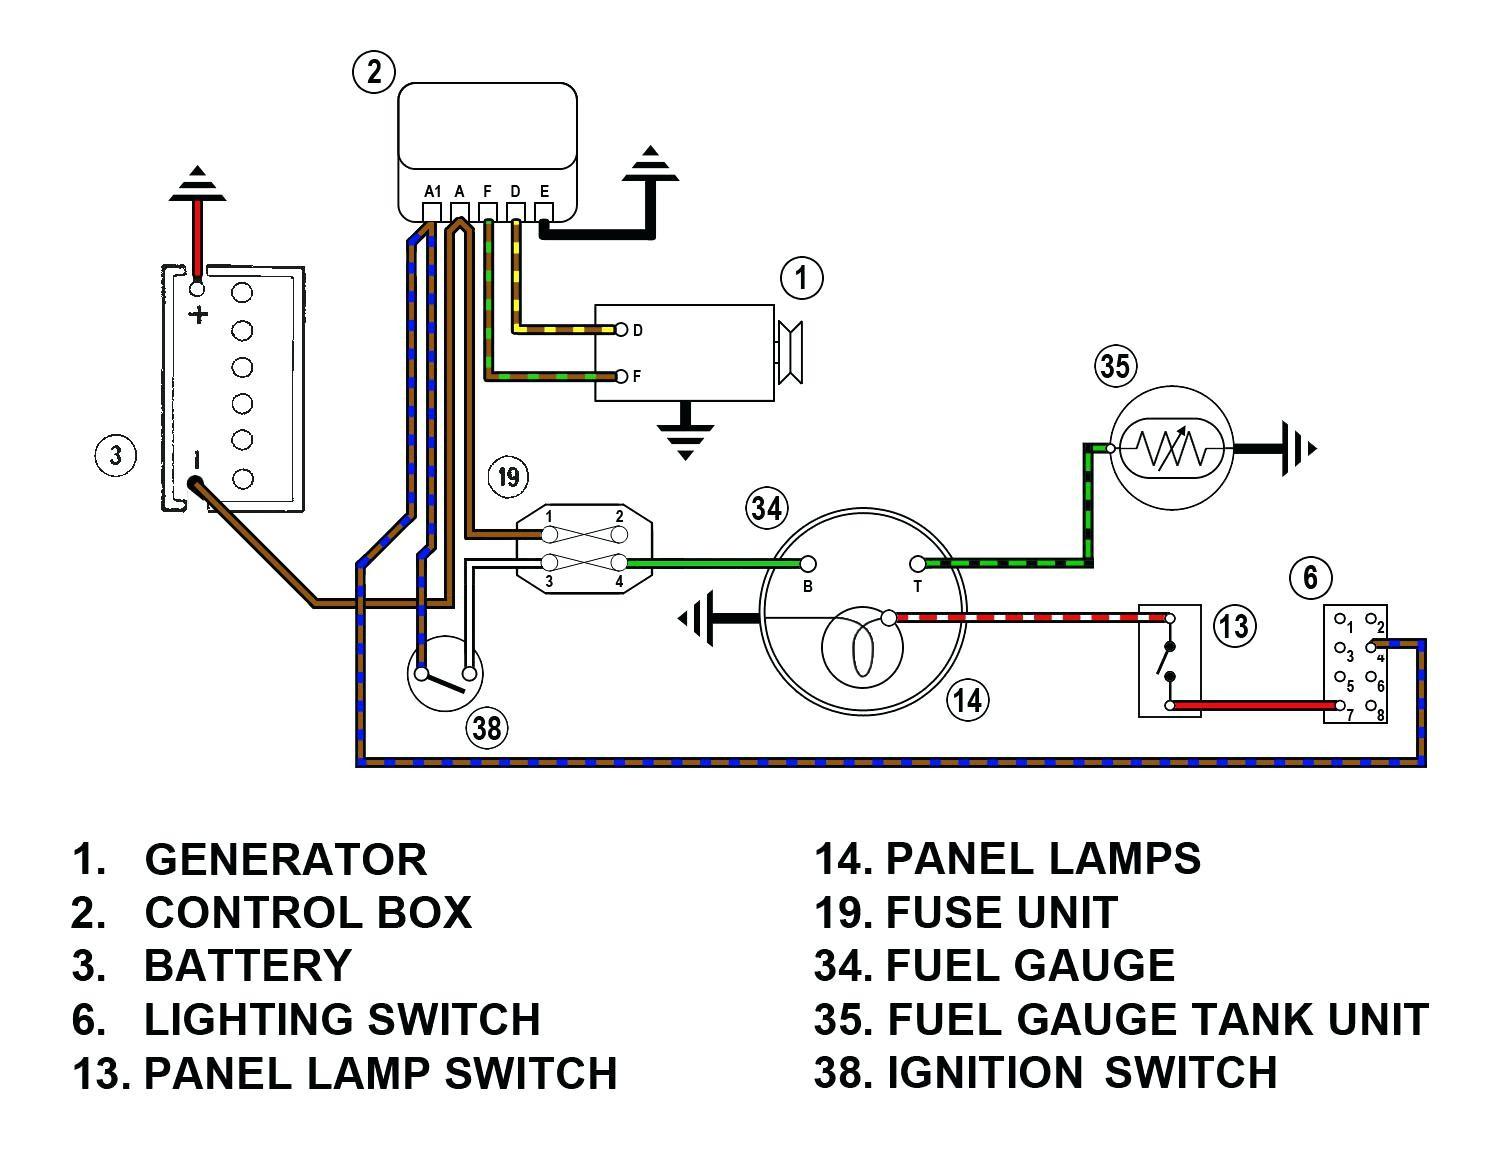 hight resolution of trailer junction box wiring diagram new wiring diagram image bobcat wiring diagram full pj homebrew